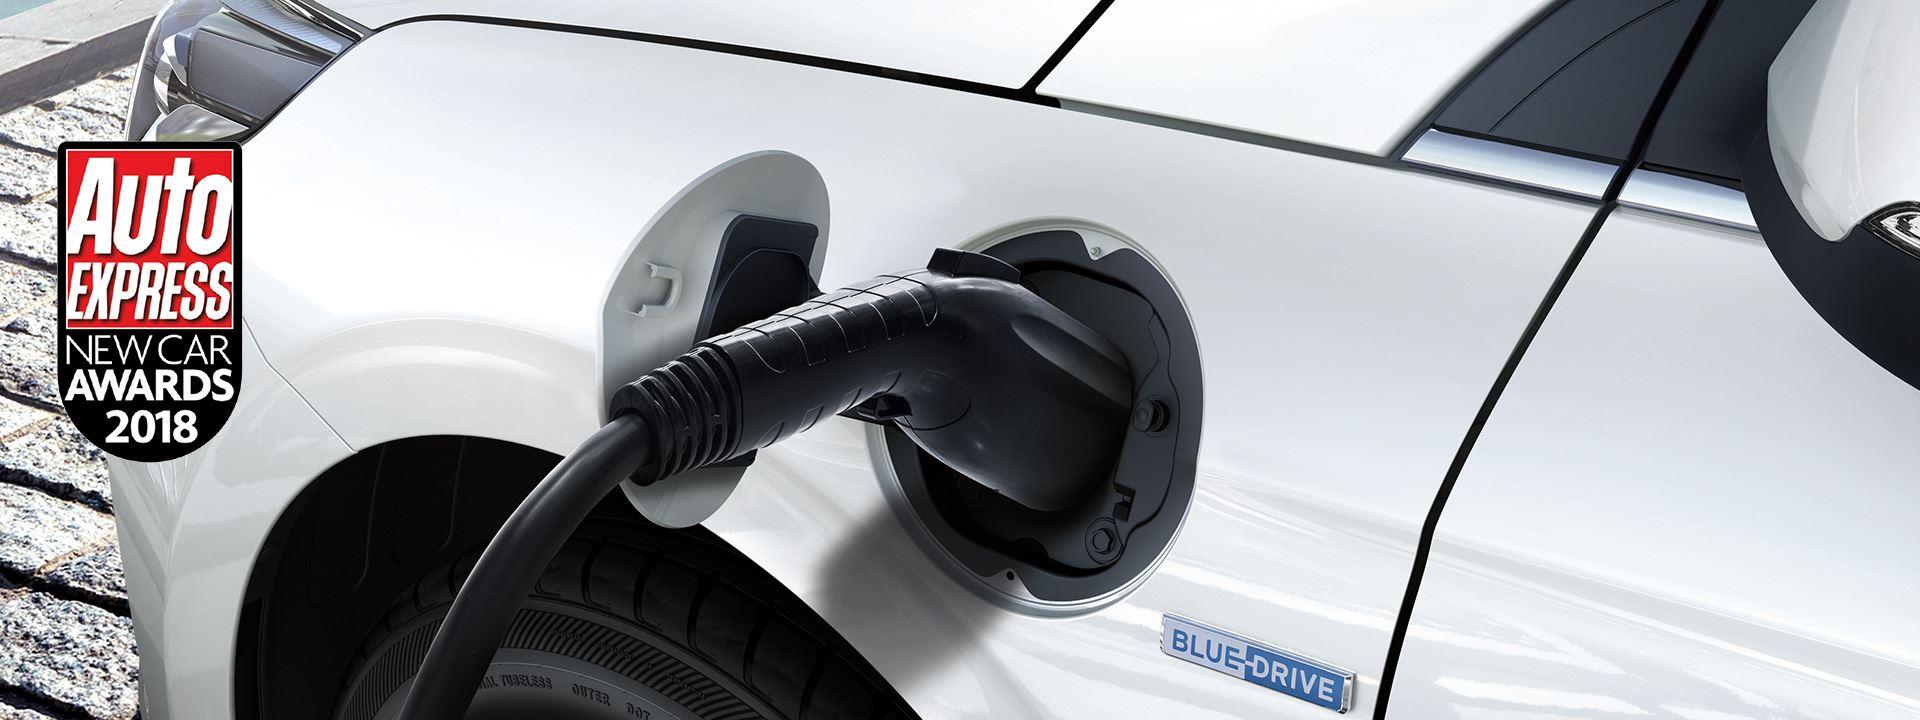 Auto Express New Car Awards 2018 Voor Kona Electric En Ioniq Plug In